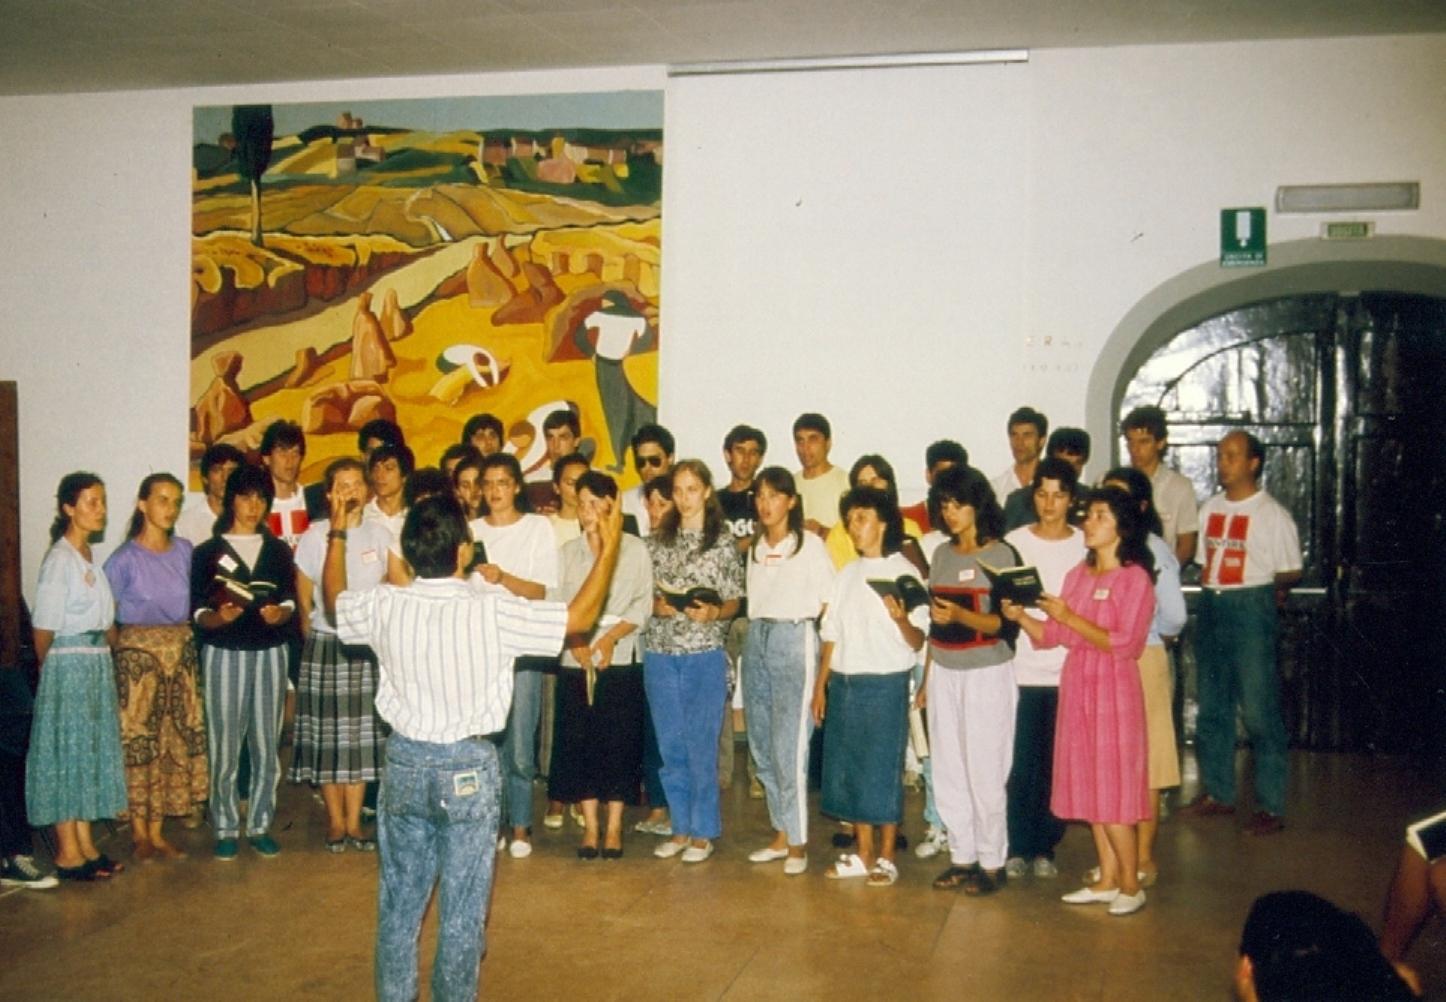 VALERICA URSACHE DIRIJORUL CORULUI VECHII BISERICI CRESTINE DUPA EVANGHELIE DRAGOS VODA LA SERATA MUZICALA DIN POGGIO UBERTINI ITALIA 1990